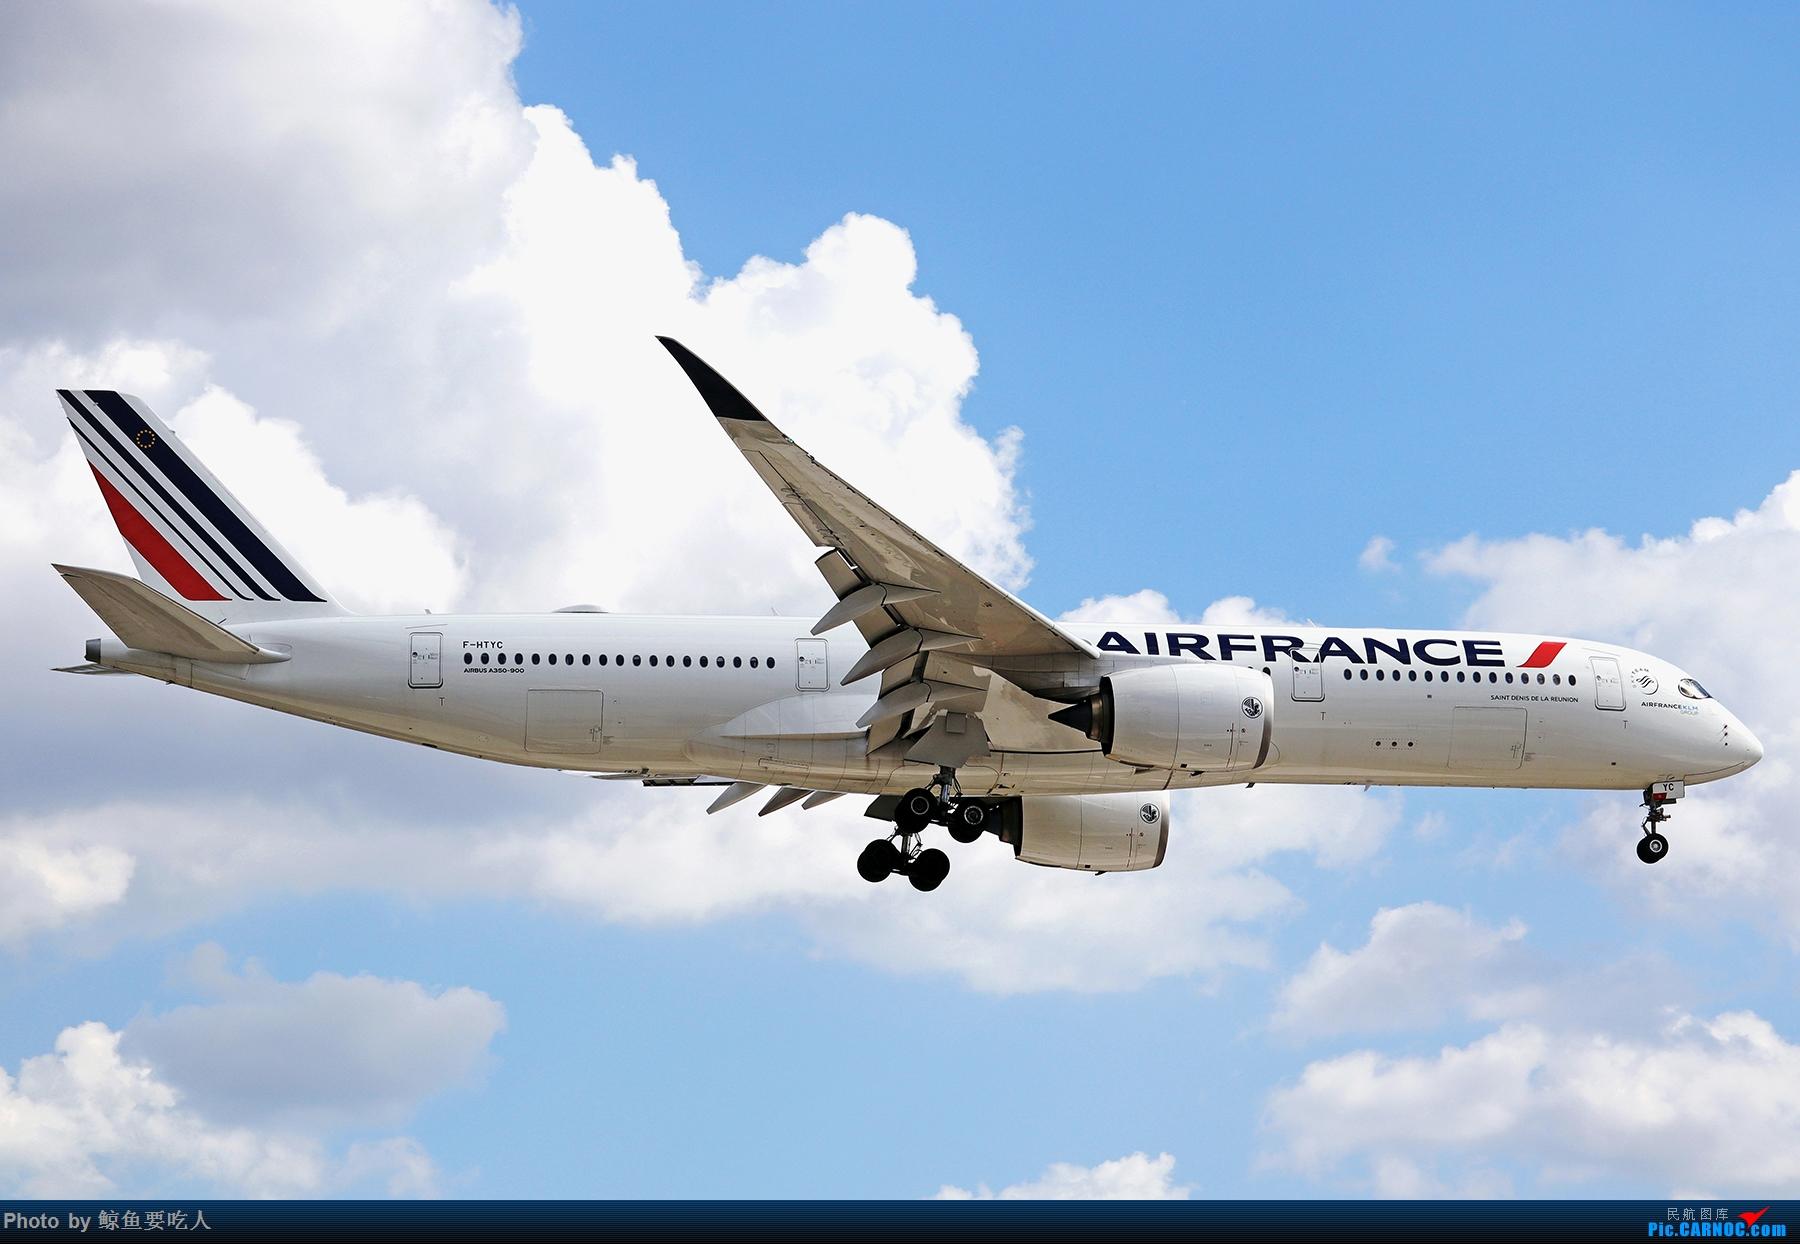 Re:[原创]【多图党】见证疫情后逐步的恢复,加拿大夏日多伦多皮尔逊机场拍机~ 乐见诸航空公司复航多伦多 AIRBUS A350-900 F-HYTC 多伦多皮尔逊国际机场